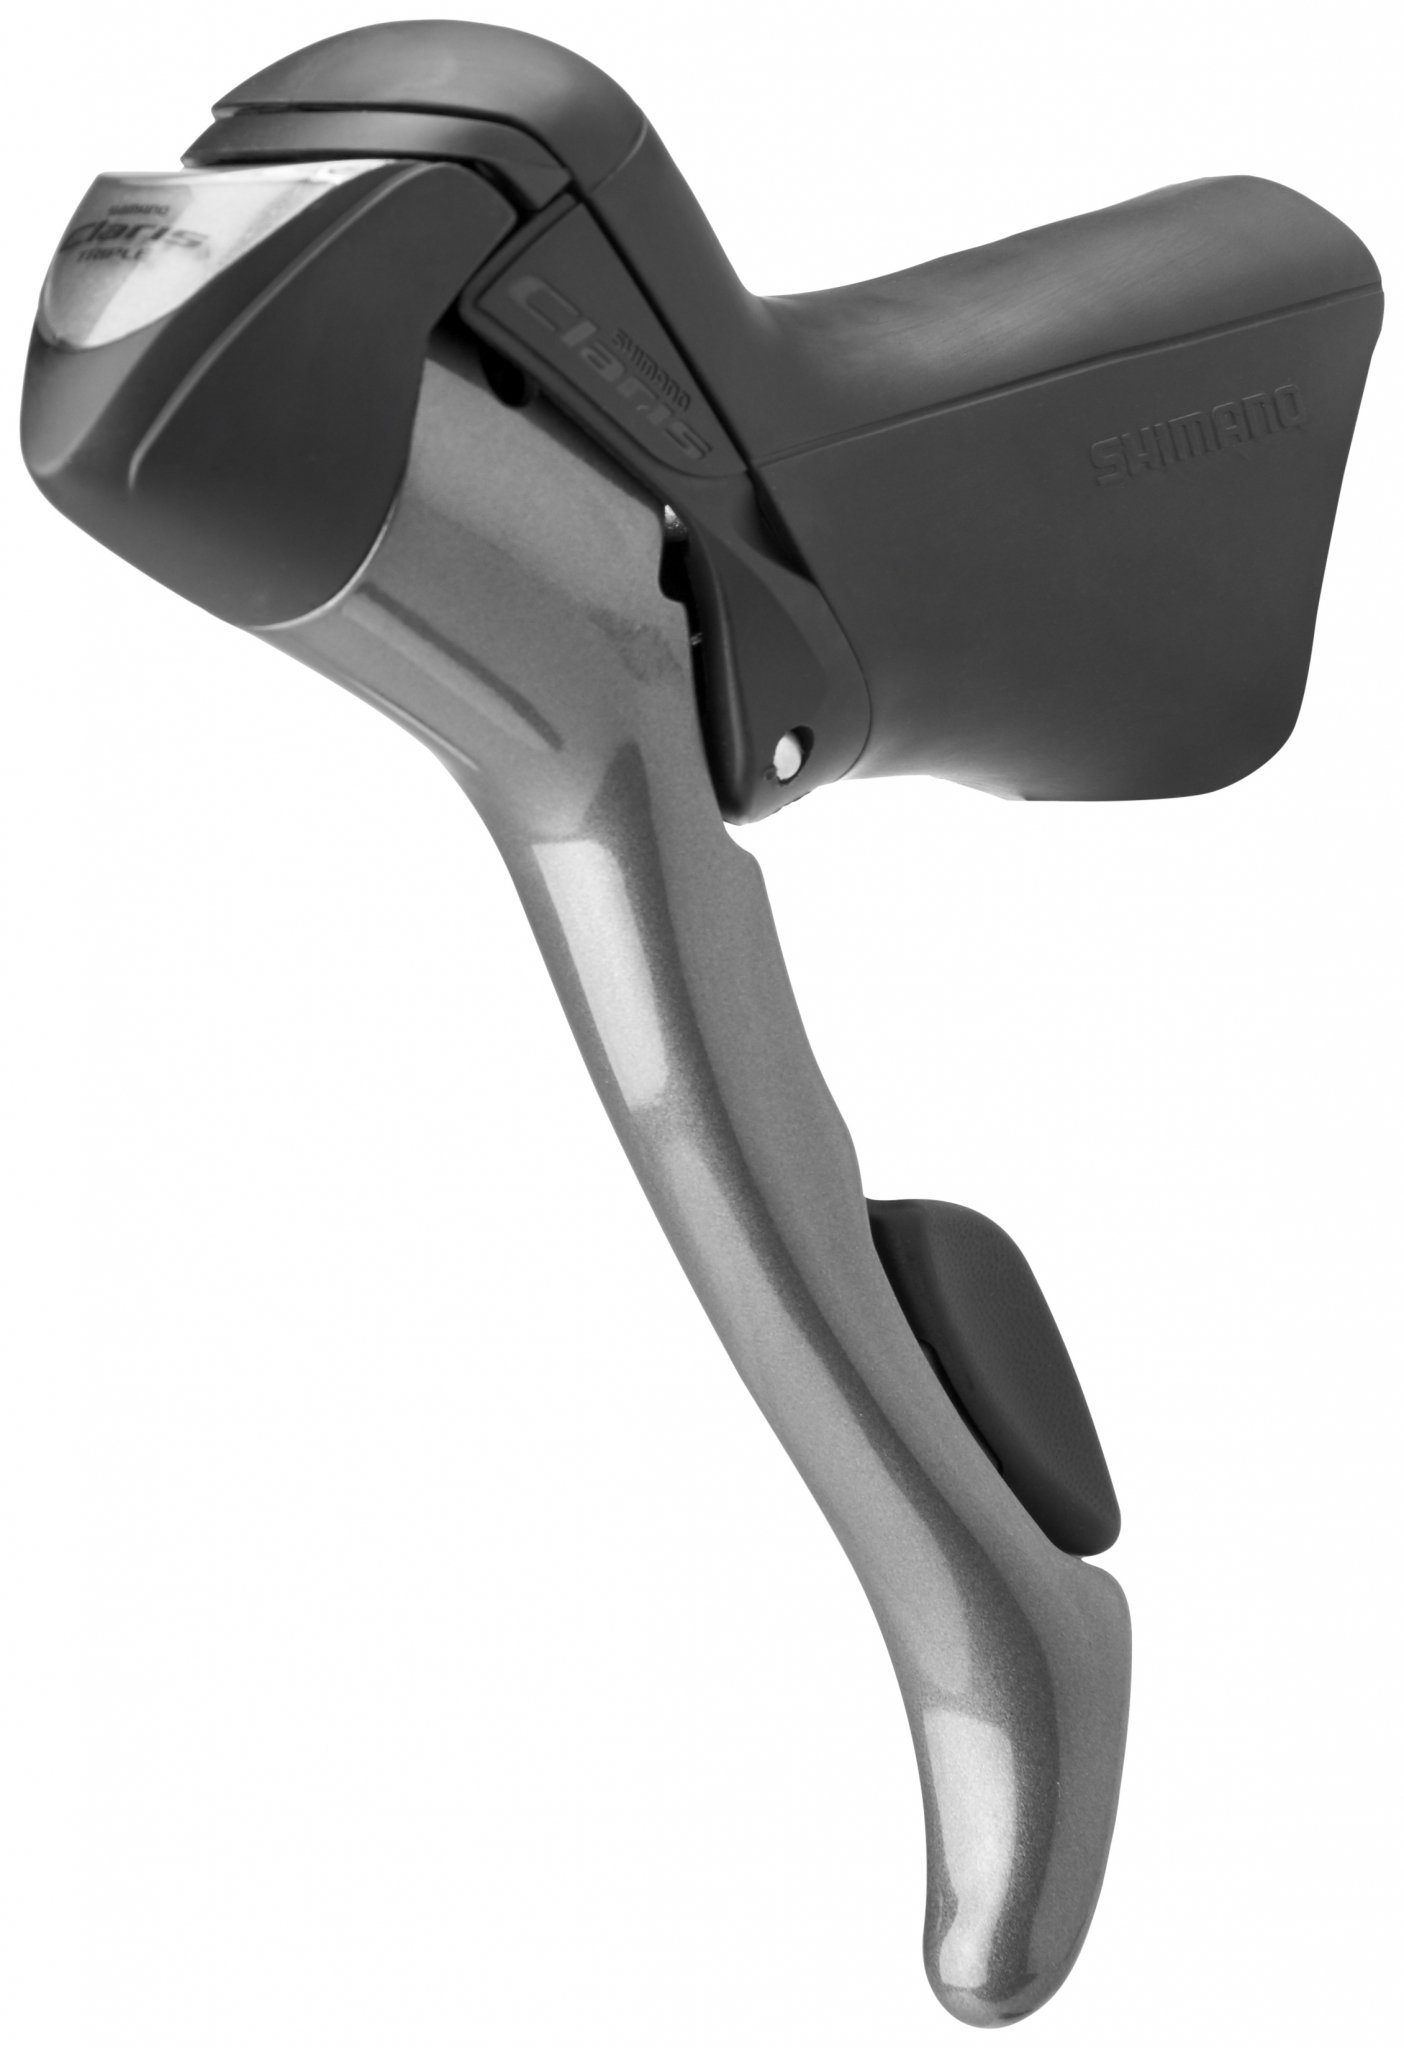 Shimano Schaltung »Claris ST-2400 Schalthebel links 3-fach«